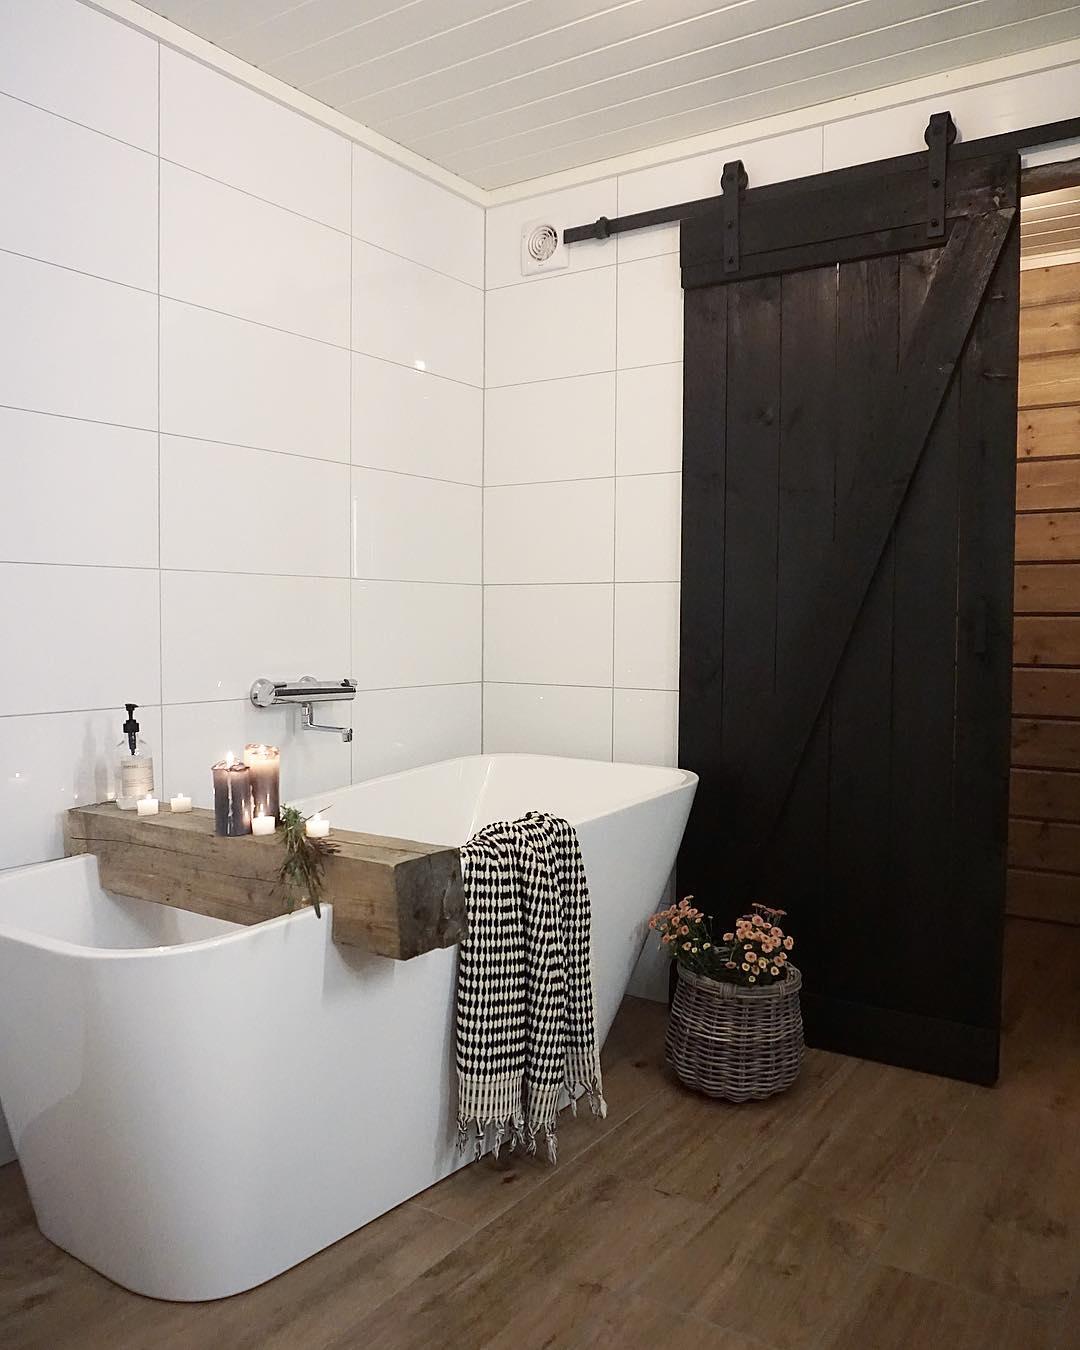 Checker Towel Turkish Towelson Instagramspa Bathroomsblack Fridaycouponcouponsspa Baths